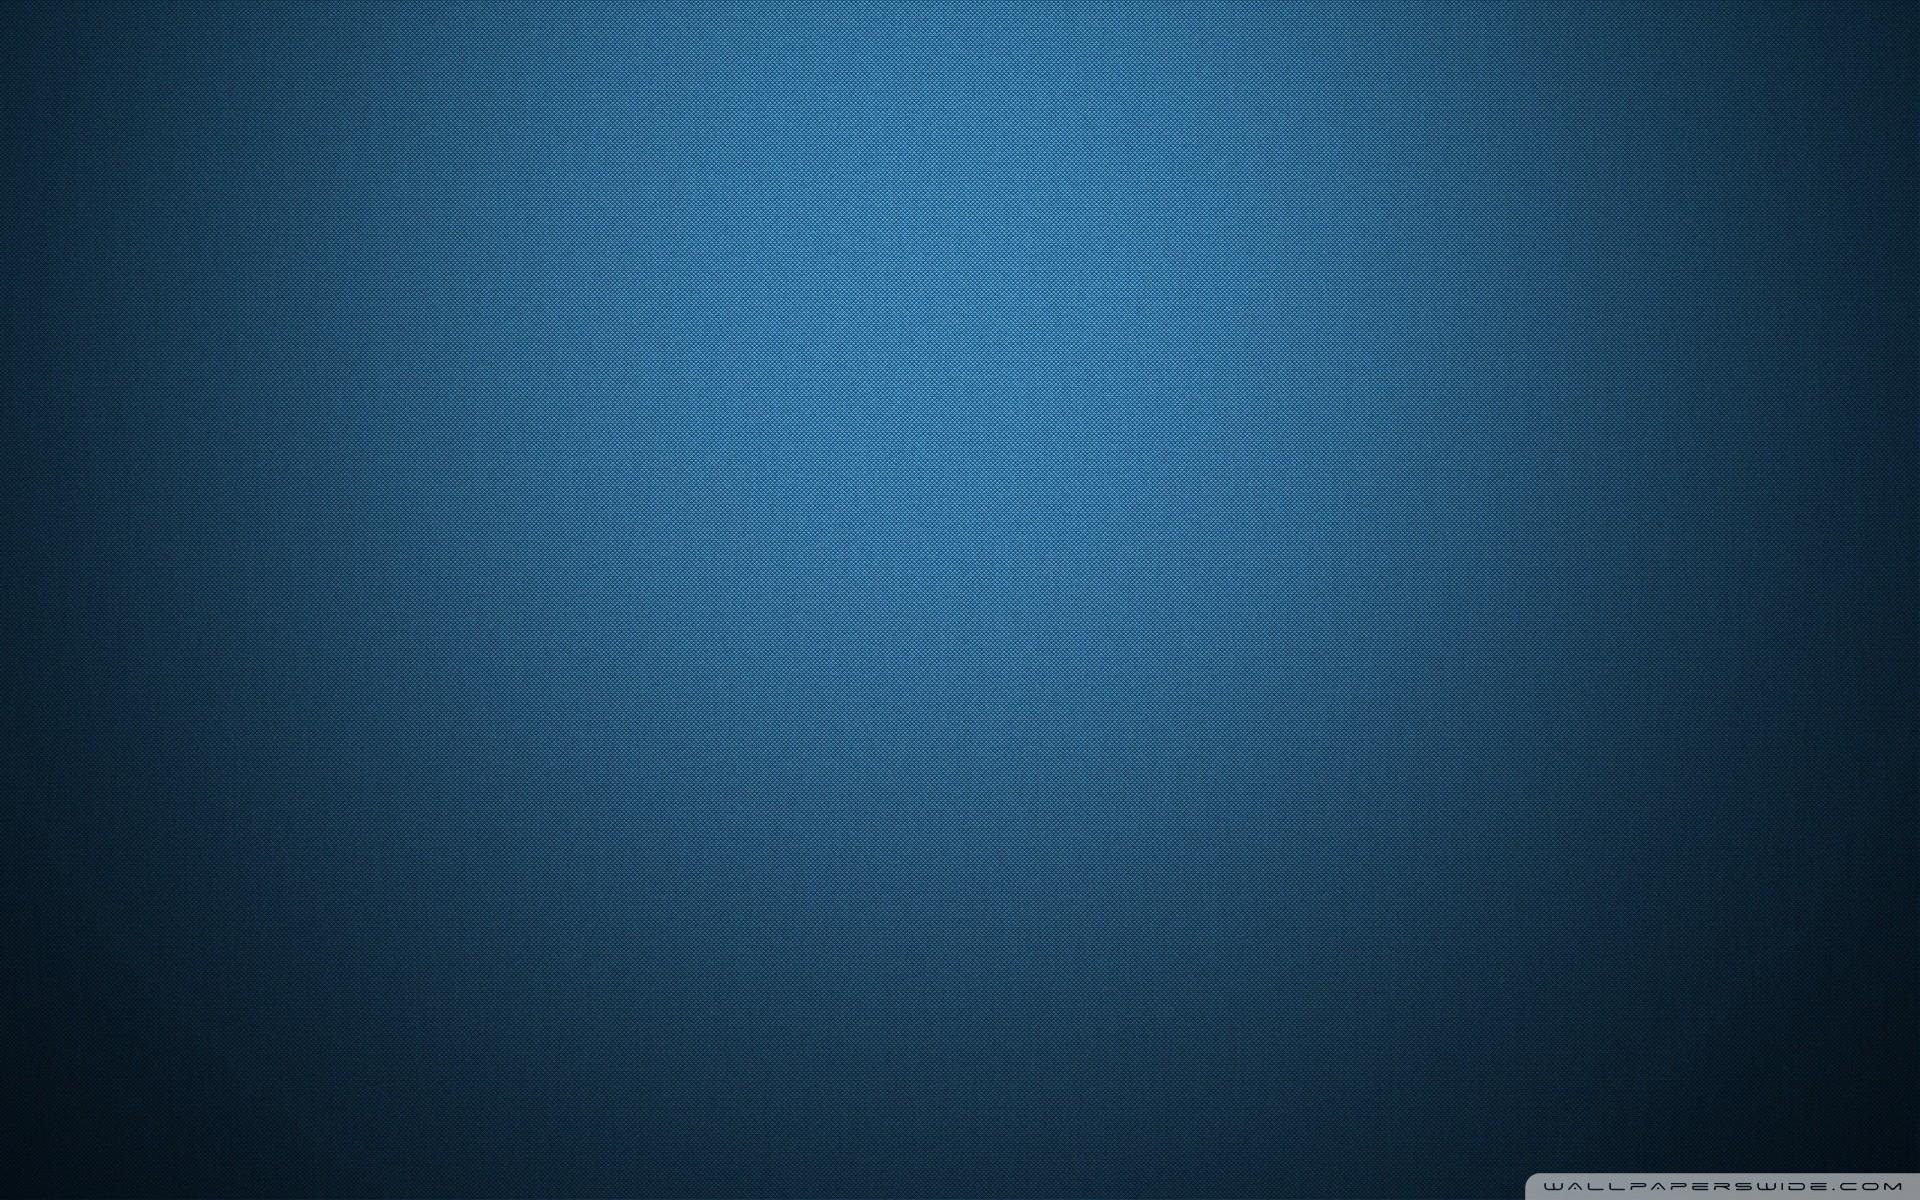 1920x1200 Wallpapers For Plain Dark Blue Wallpaper